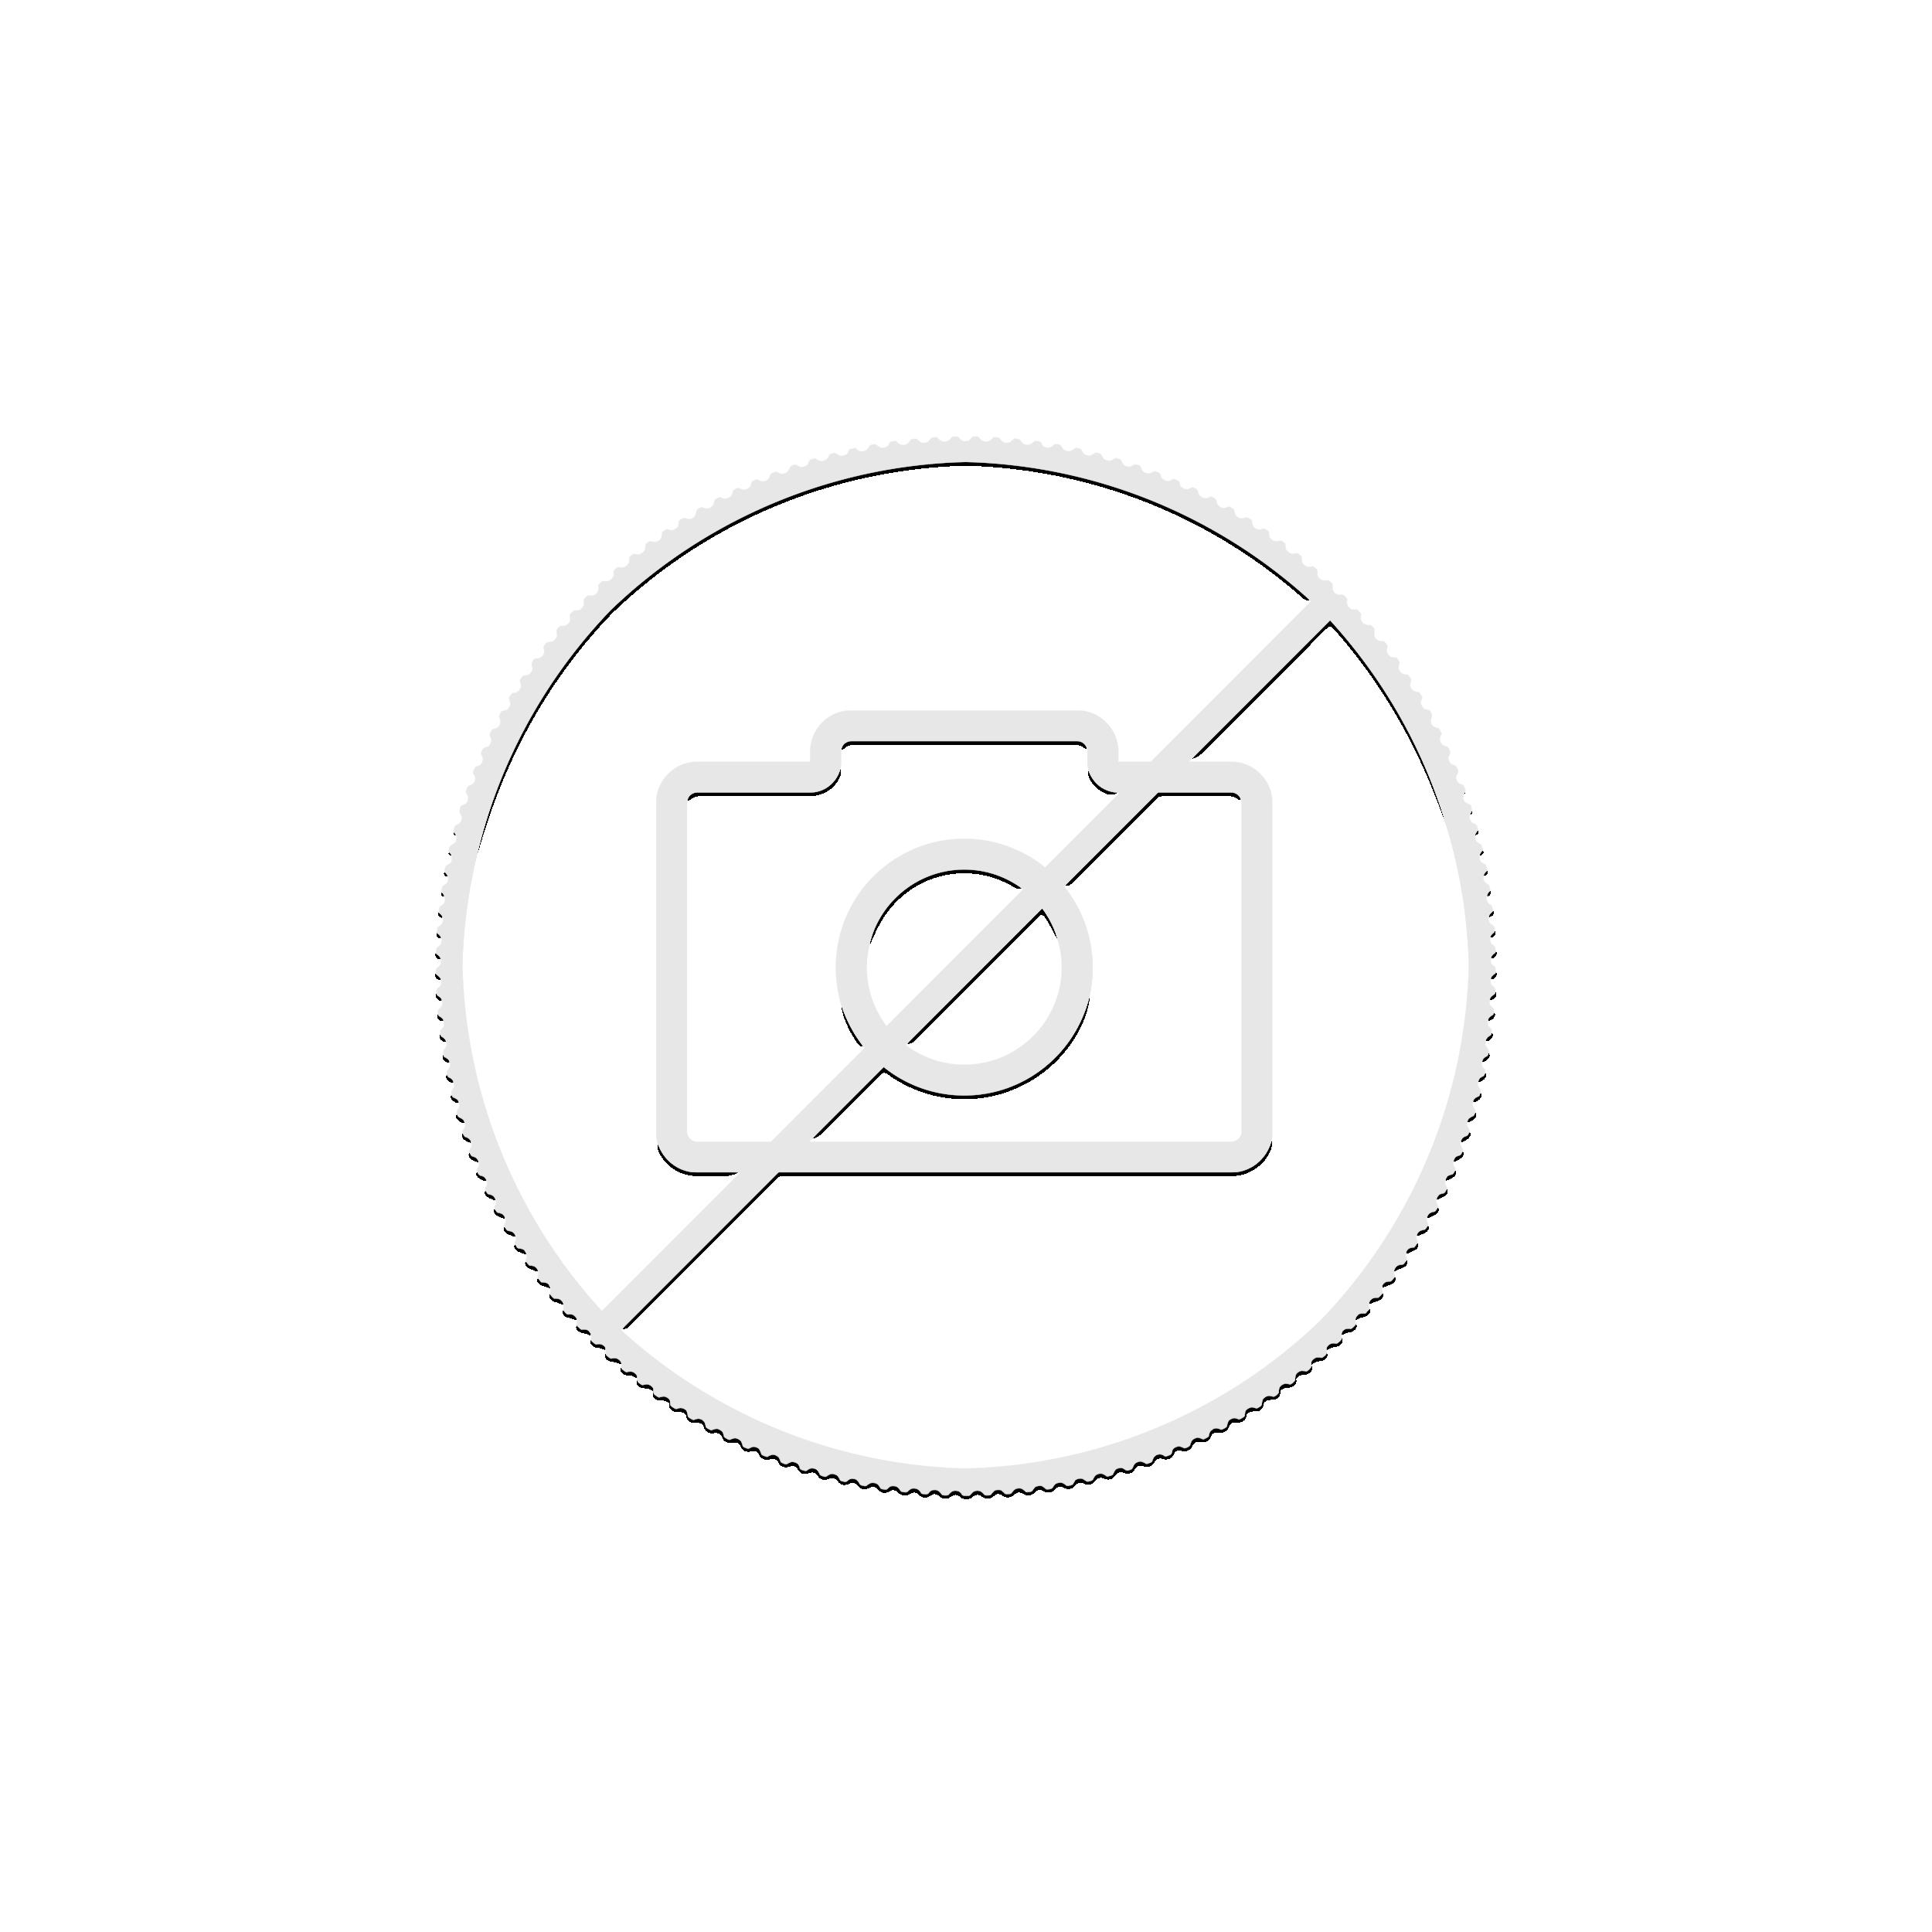 2 troy ounce zilveren munt Samoa Hygieia Piedfort 2020